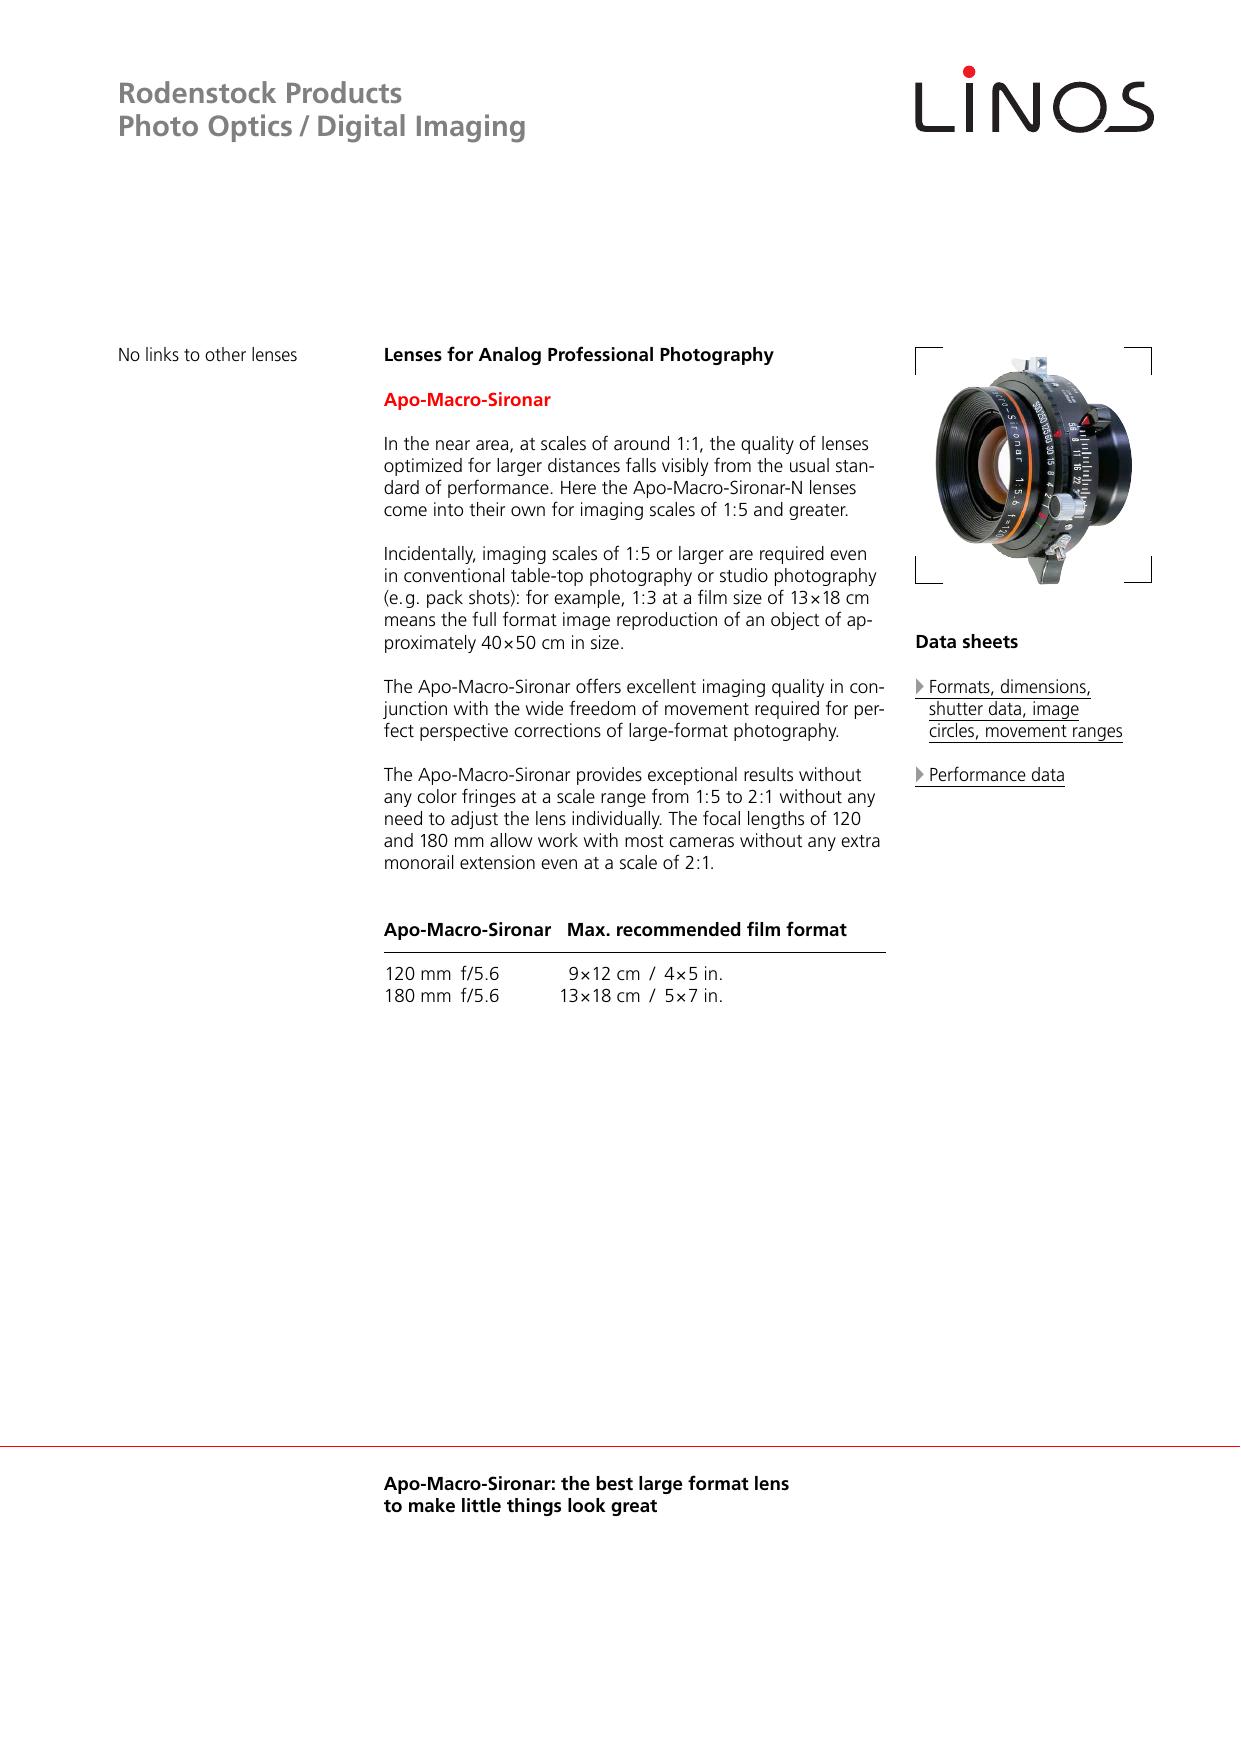 LINOS/Rodenstock PDF 9-11 English | manualzz com